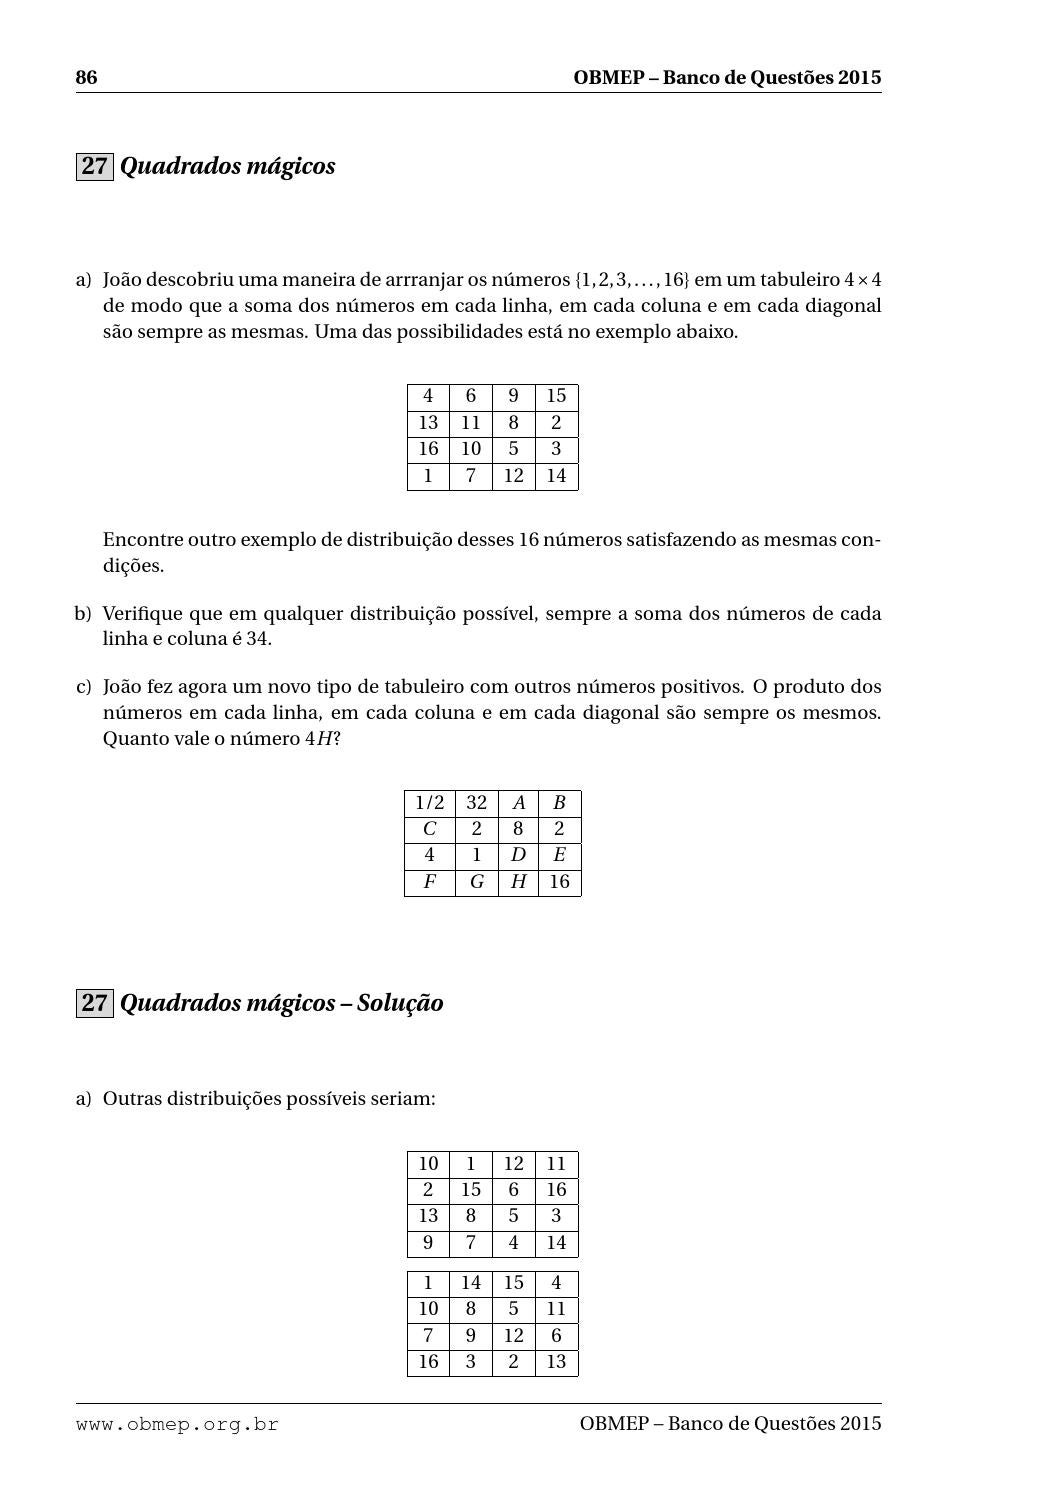 fef1910f2 Banco de questões da OBMEP 2015 by Carlos Silva - issuu